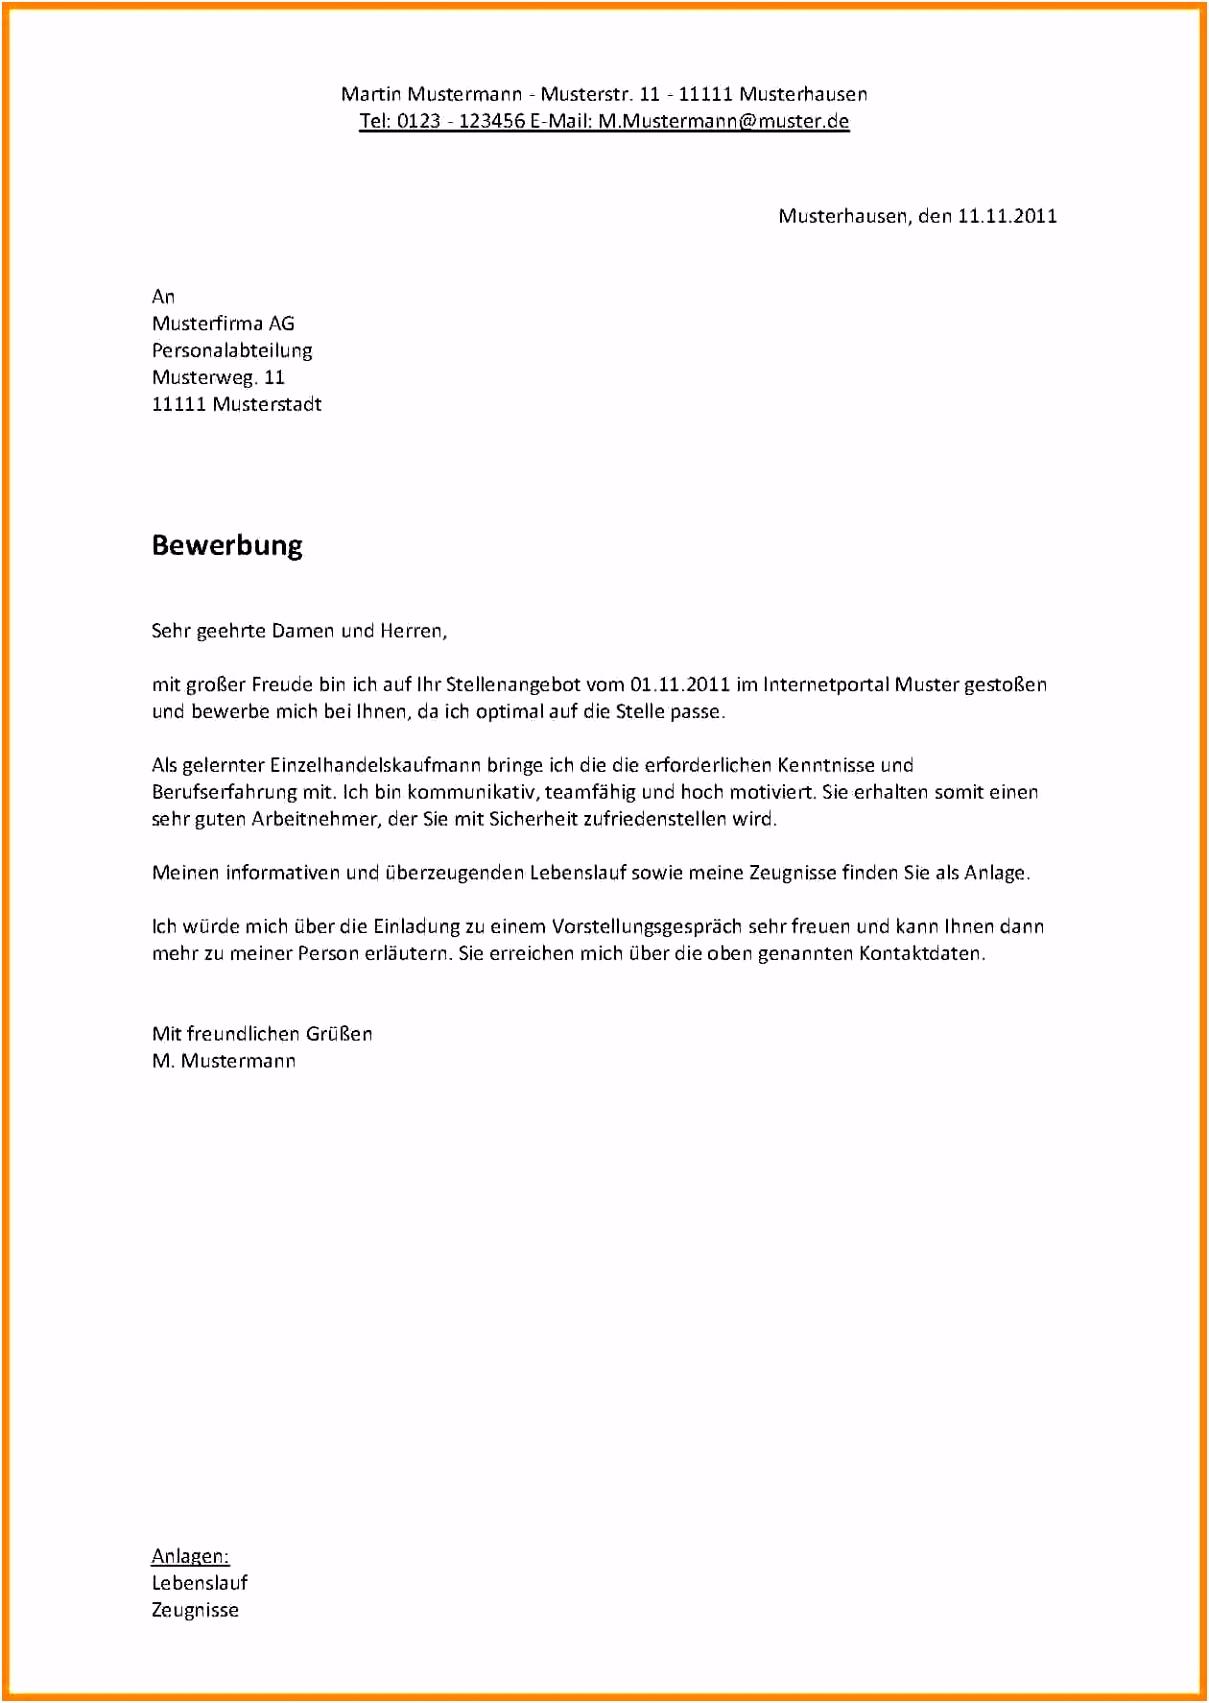 Formeller Brief Vorlage 10 Brief Musterbeispiel T4lj76aws3 W4ul42ehwu